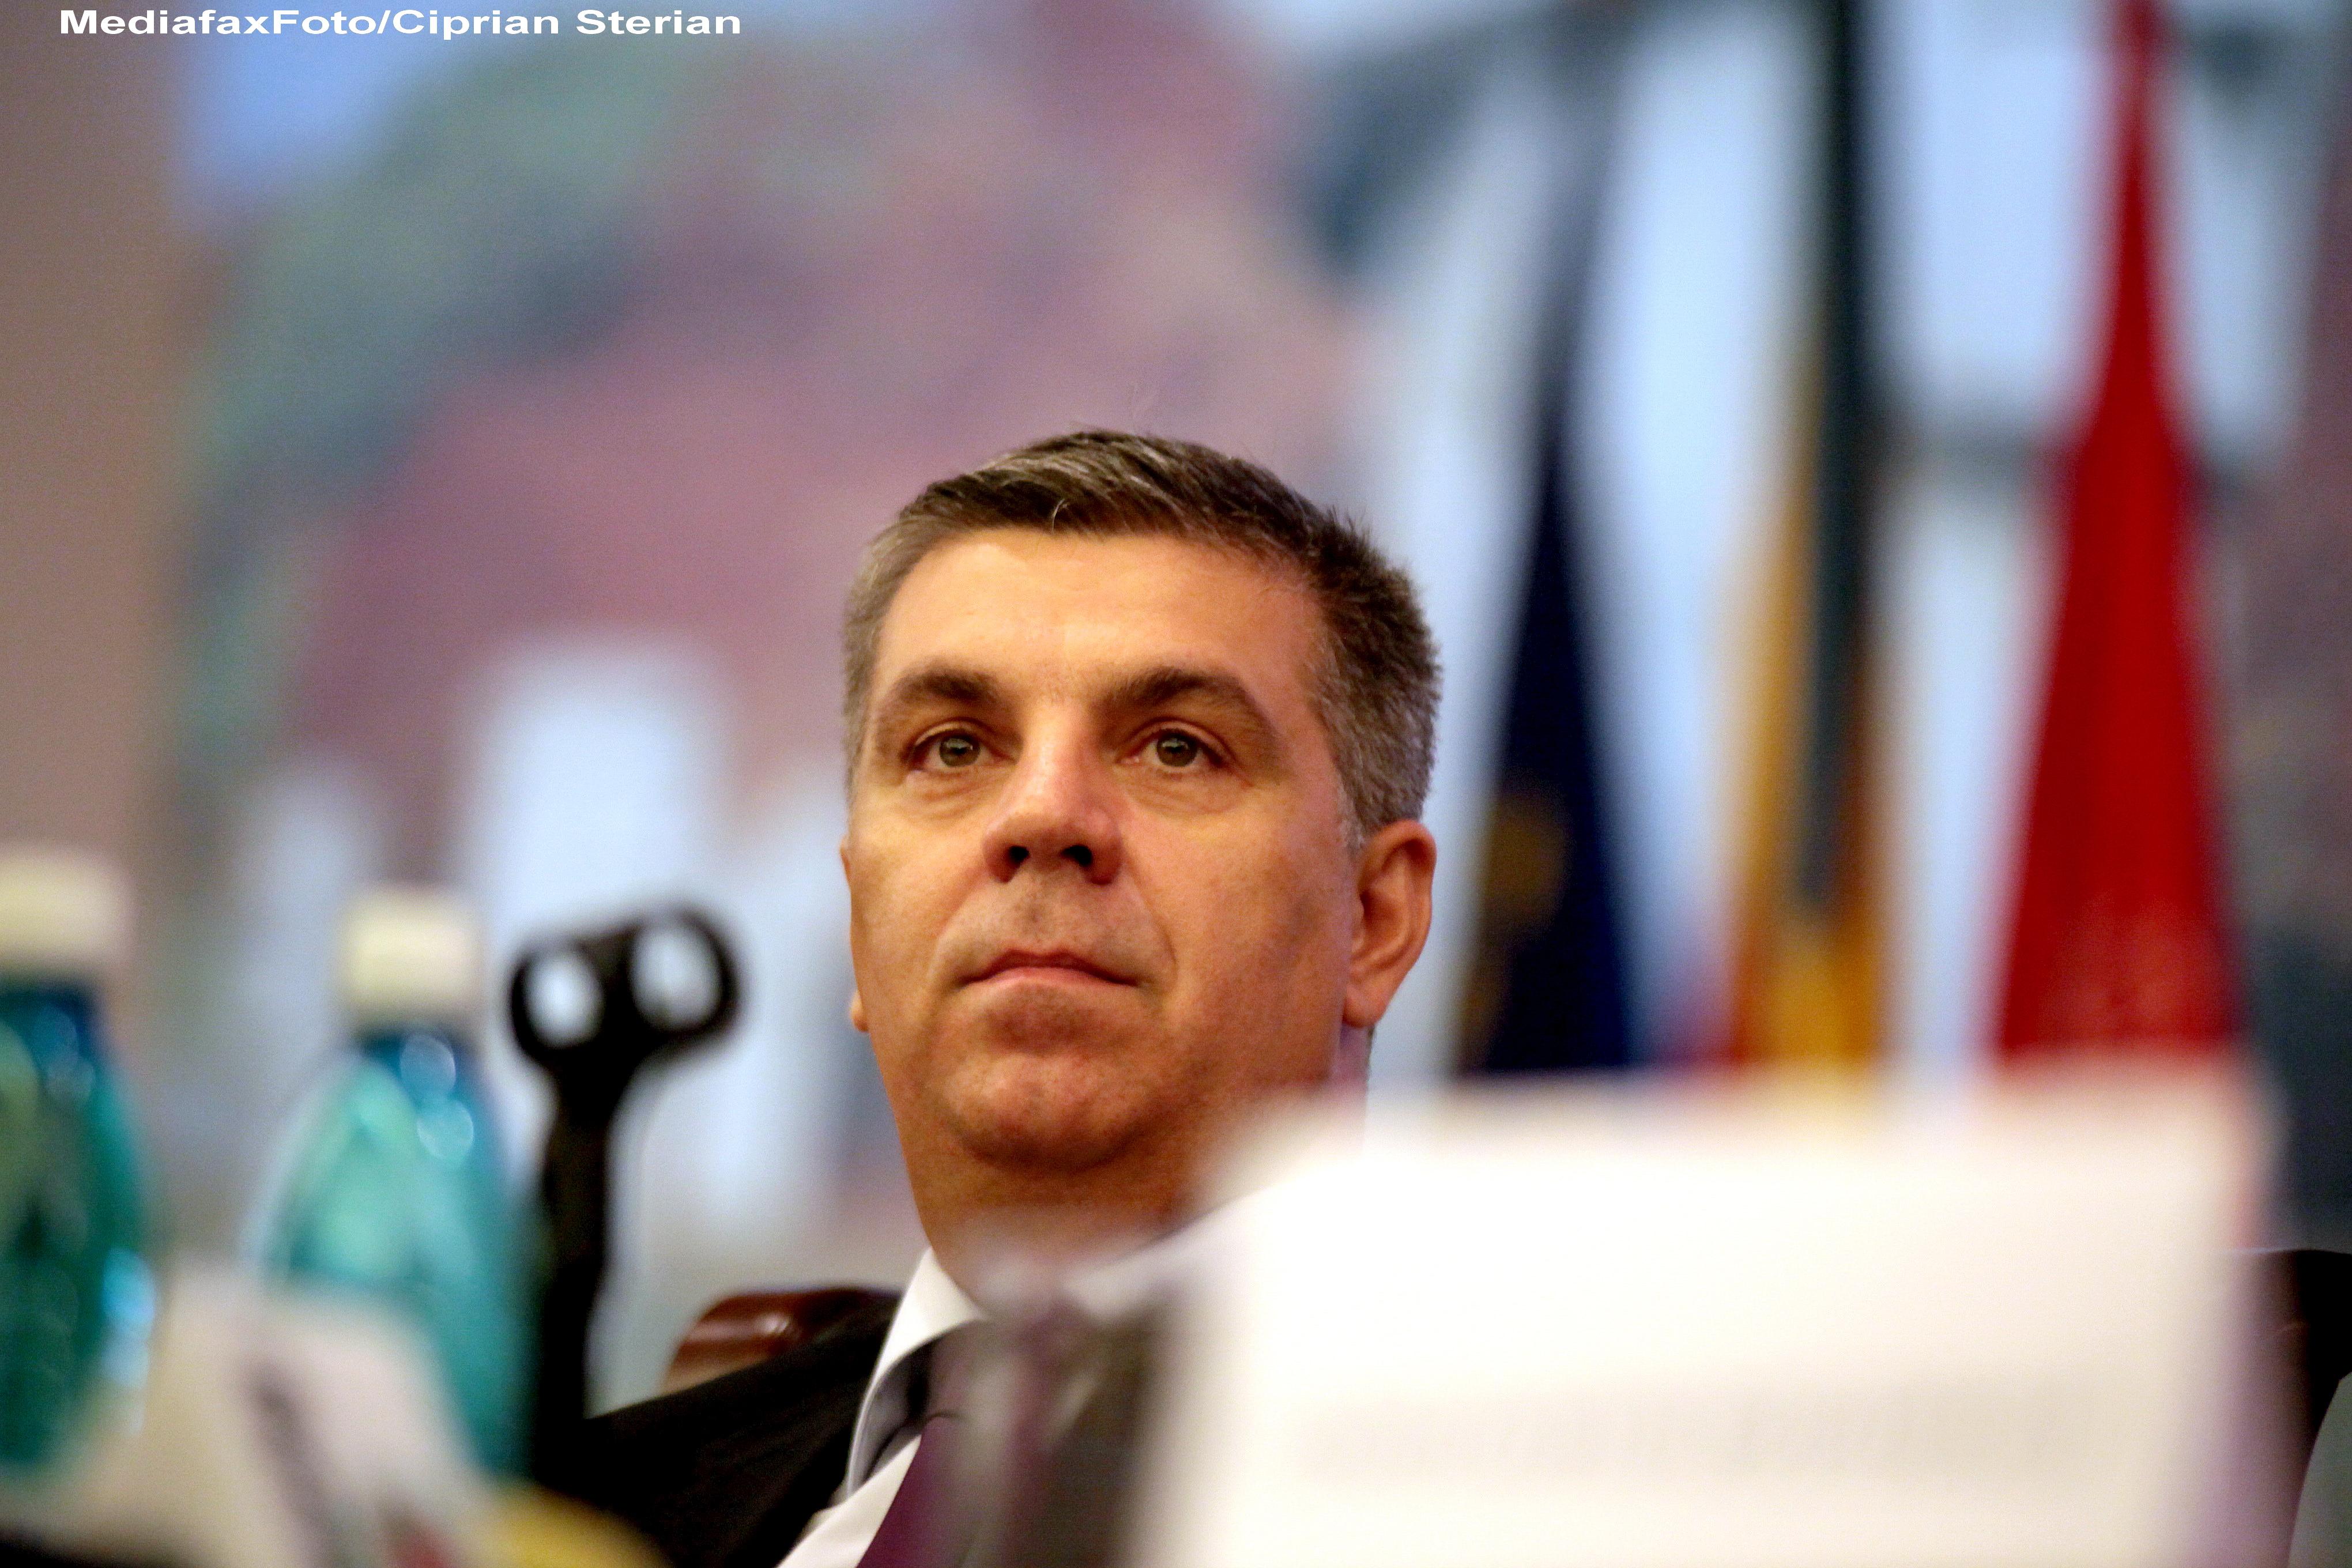 Valeriu Zgonea: Parlamentul va respecta hotararea CC, chiar daca aceasta va invalida referendumul